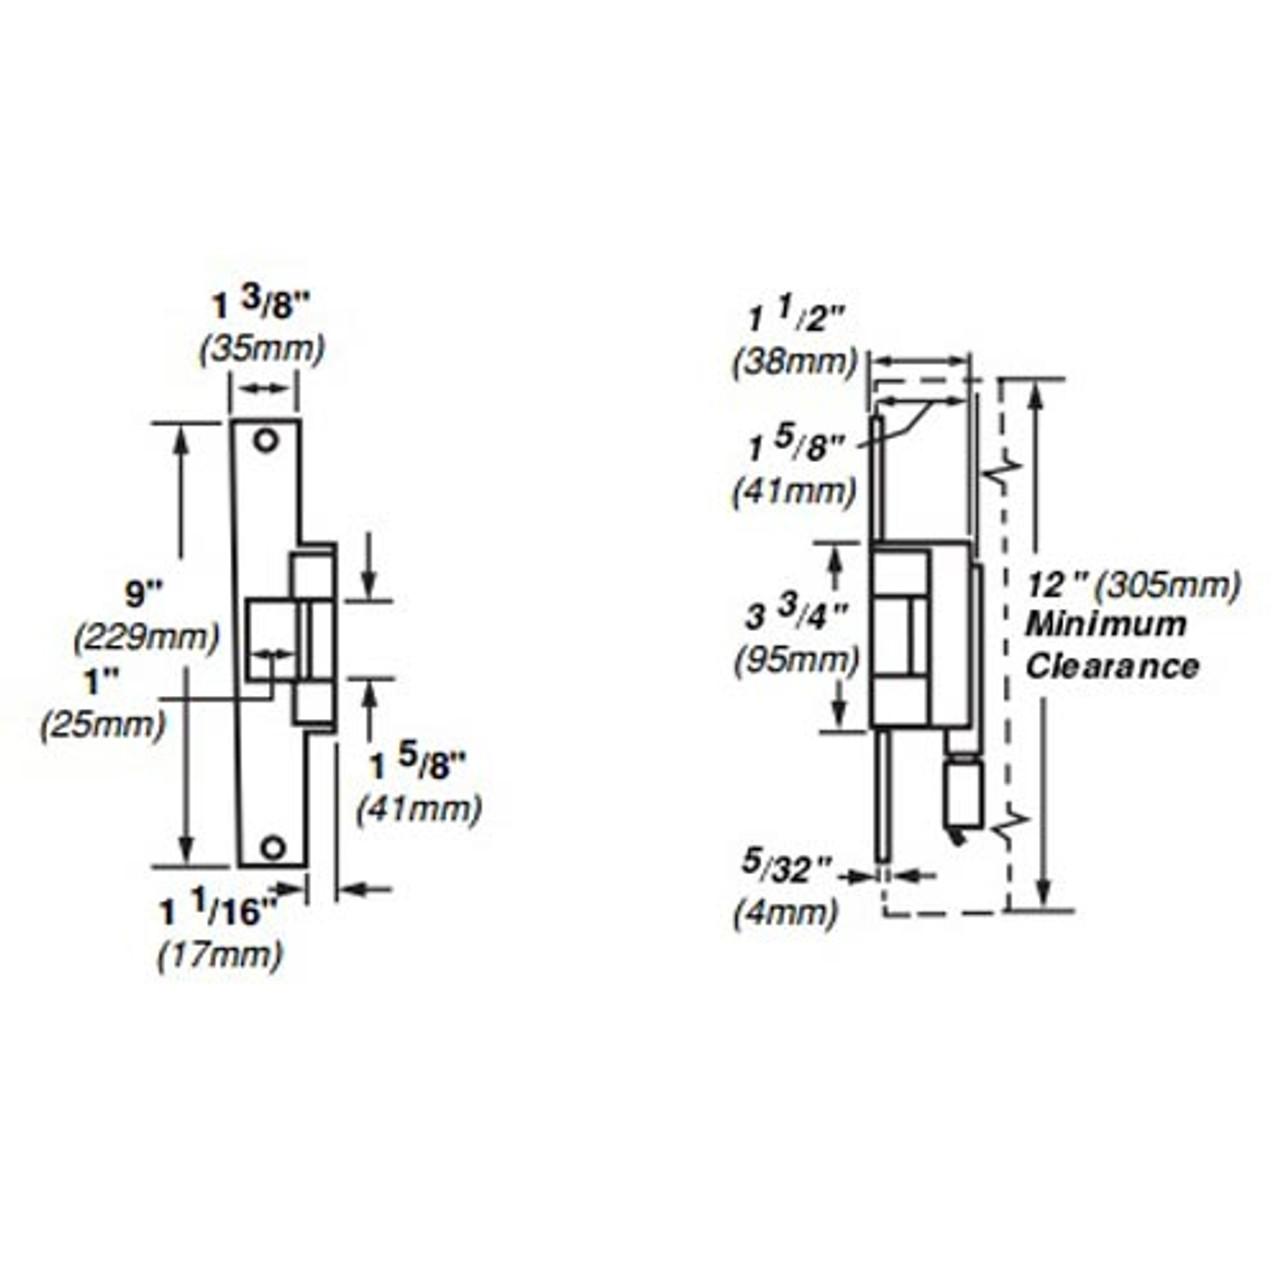 6215-FS-24VDC-US10 Von Duprin Electric Strike for Mortise or Cylindrical Locksets in Satin Bronze Finish